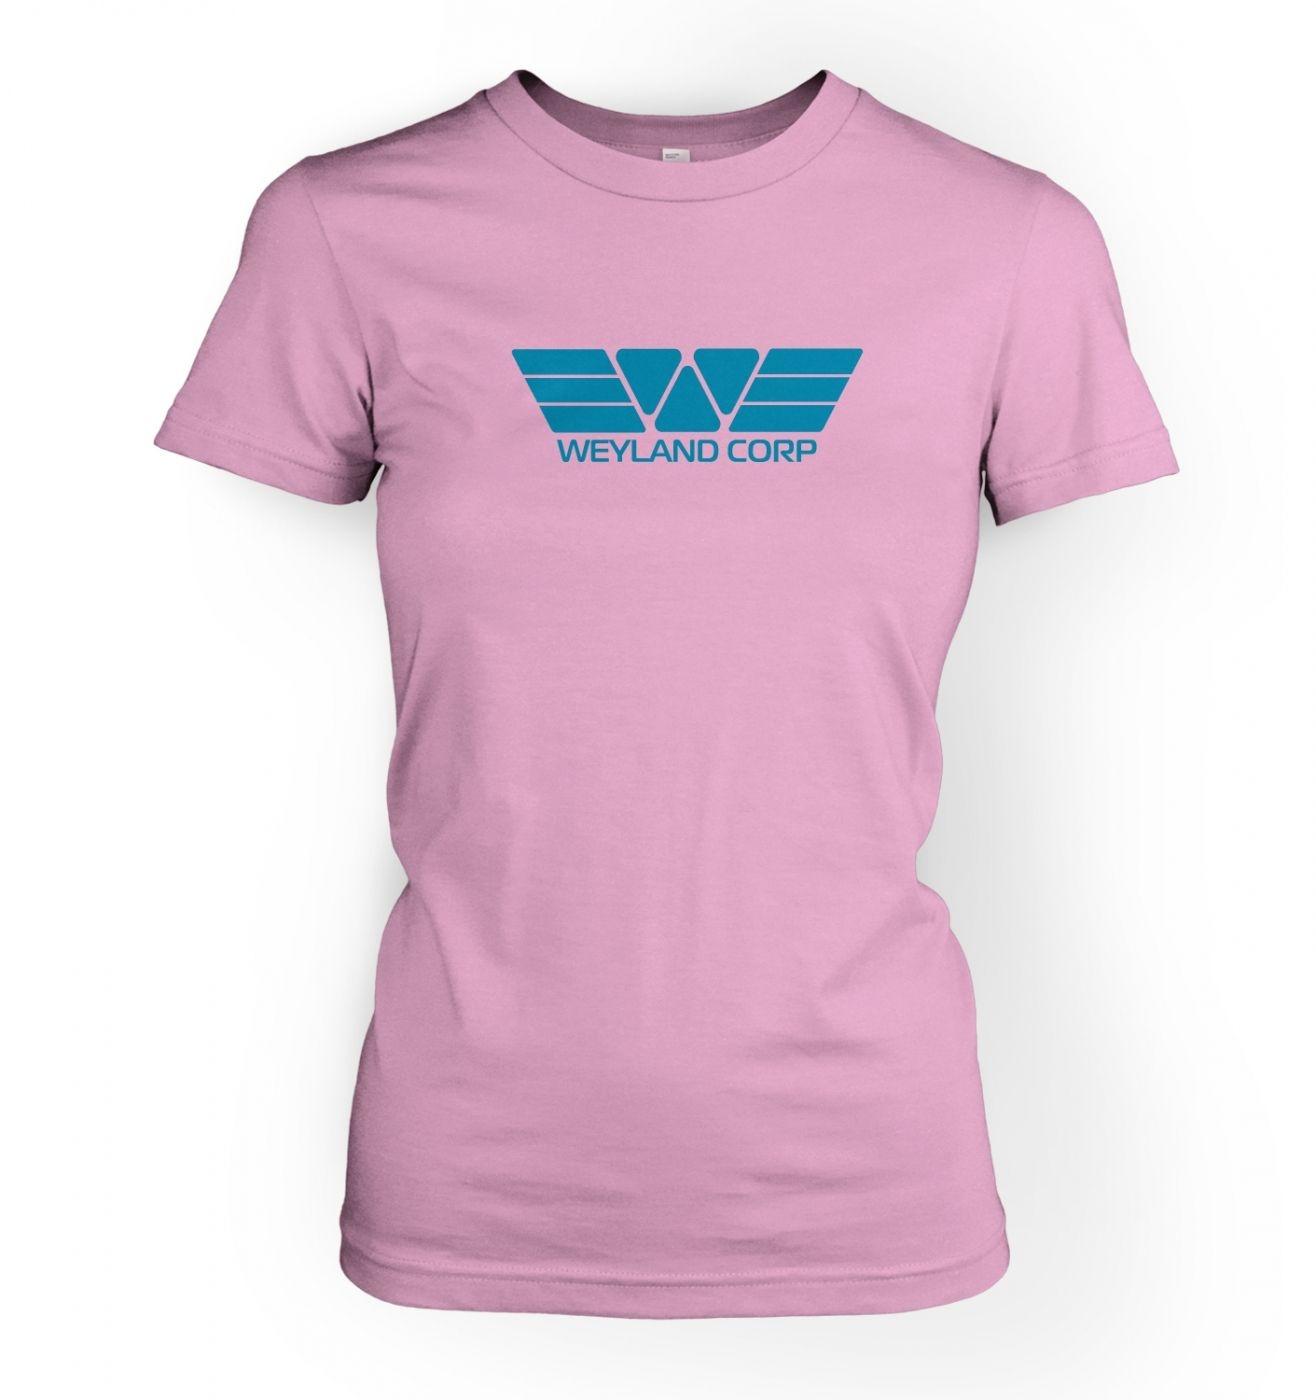 Weyland Corp (blue) women's fitted t-shirt